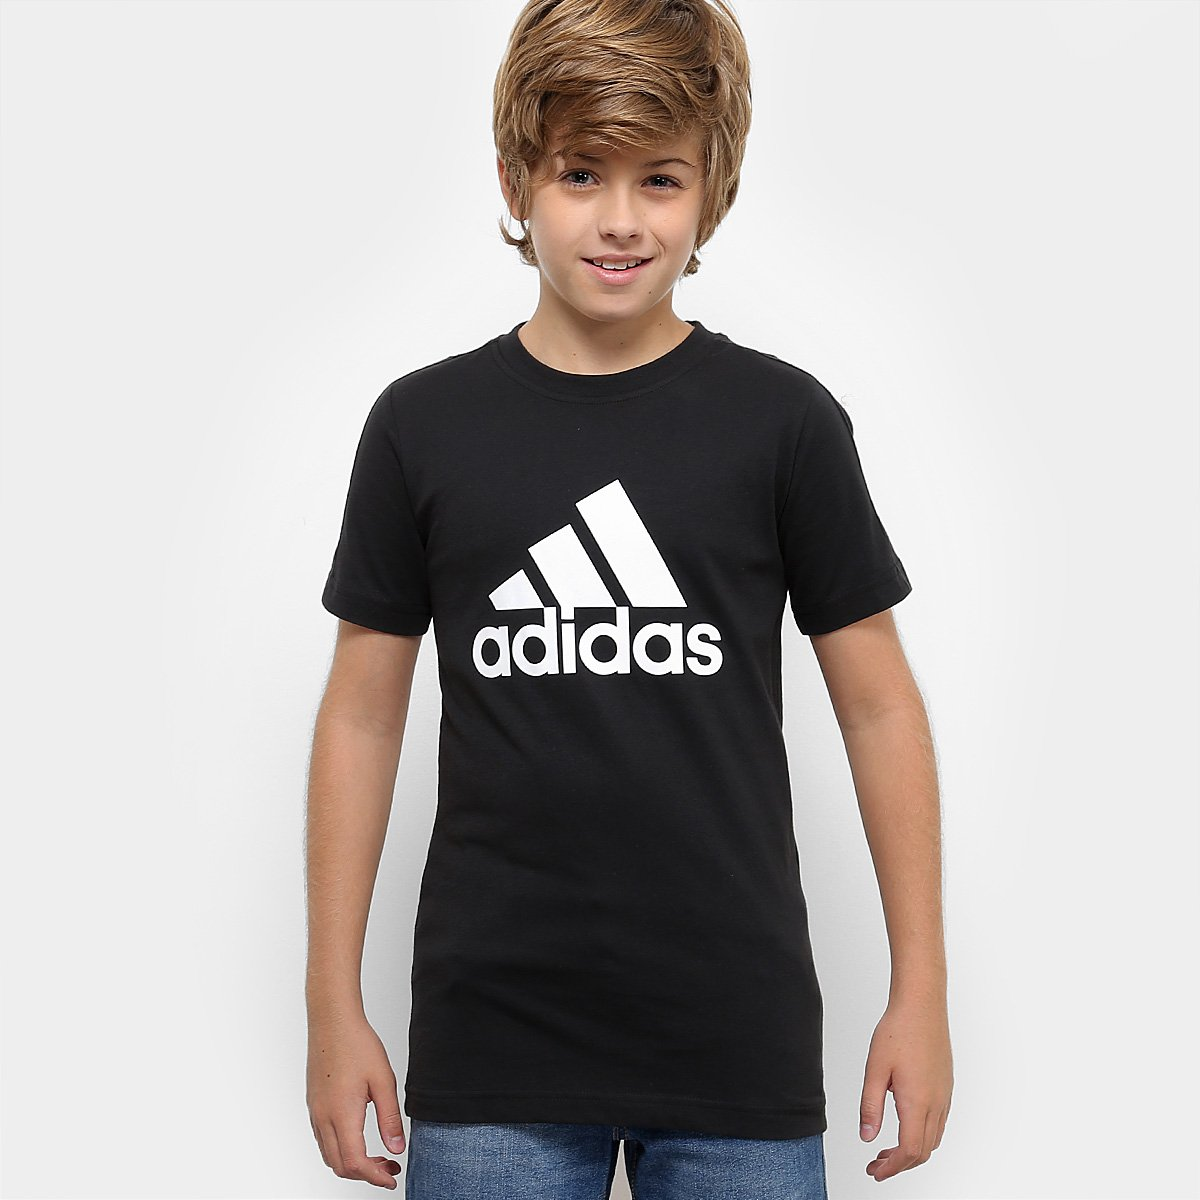 a7526e74db3 Camiseta Infantil Adidas Mc Yb Masculina - Compre Agora